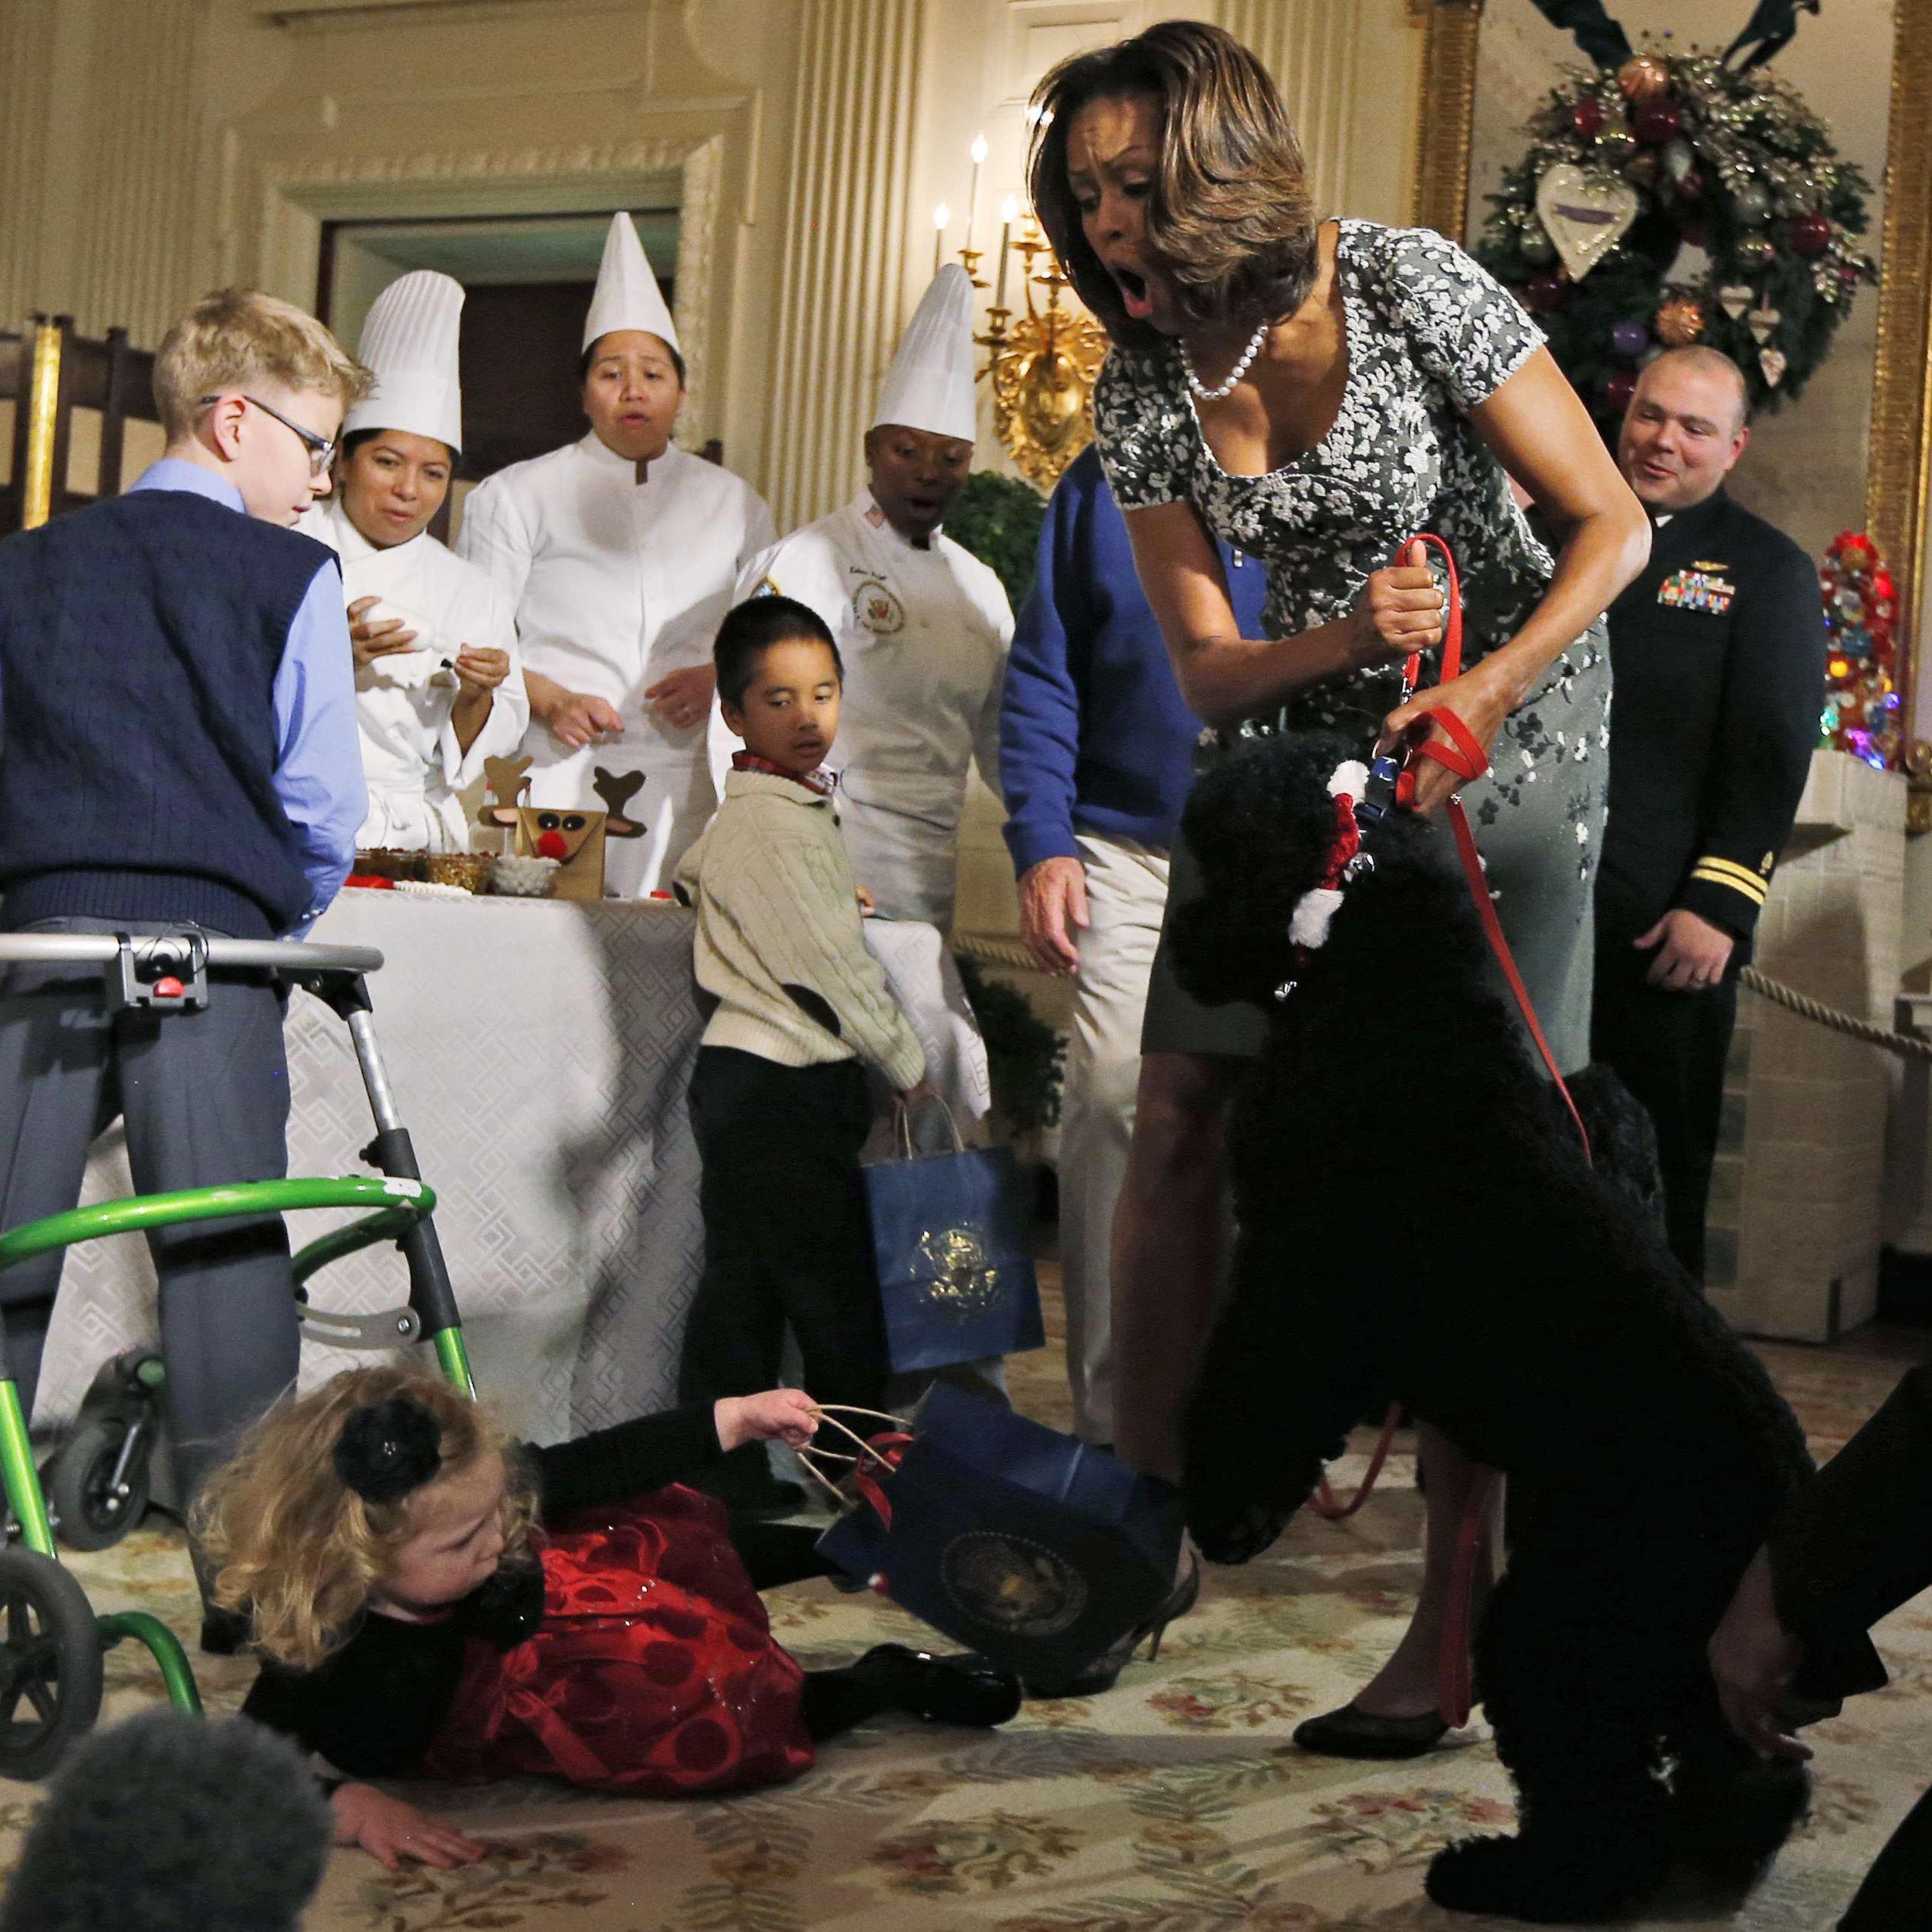 le chien des obama s attaque aux invit 233 s de la maison blanche